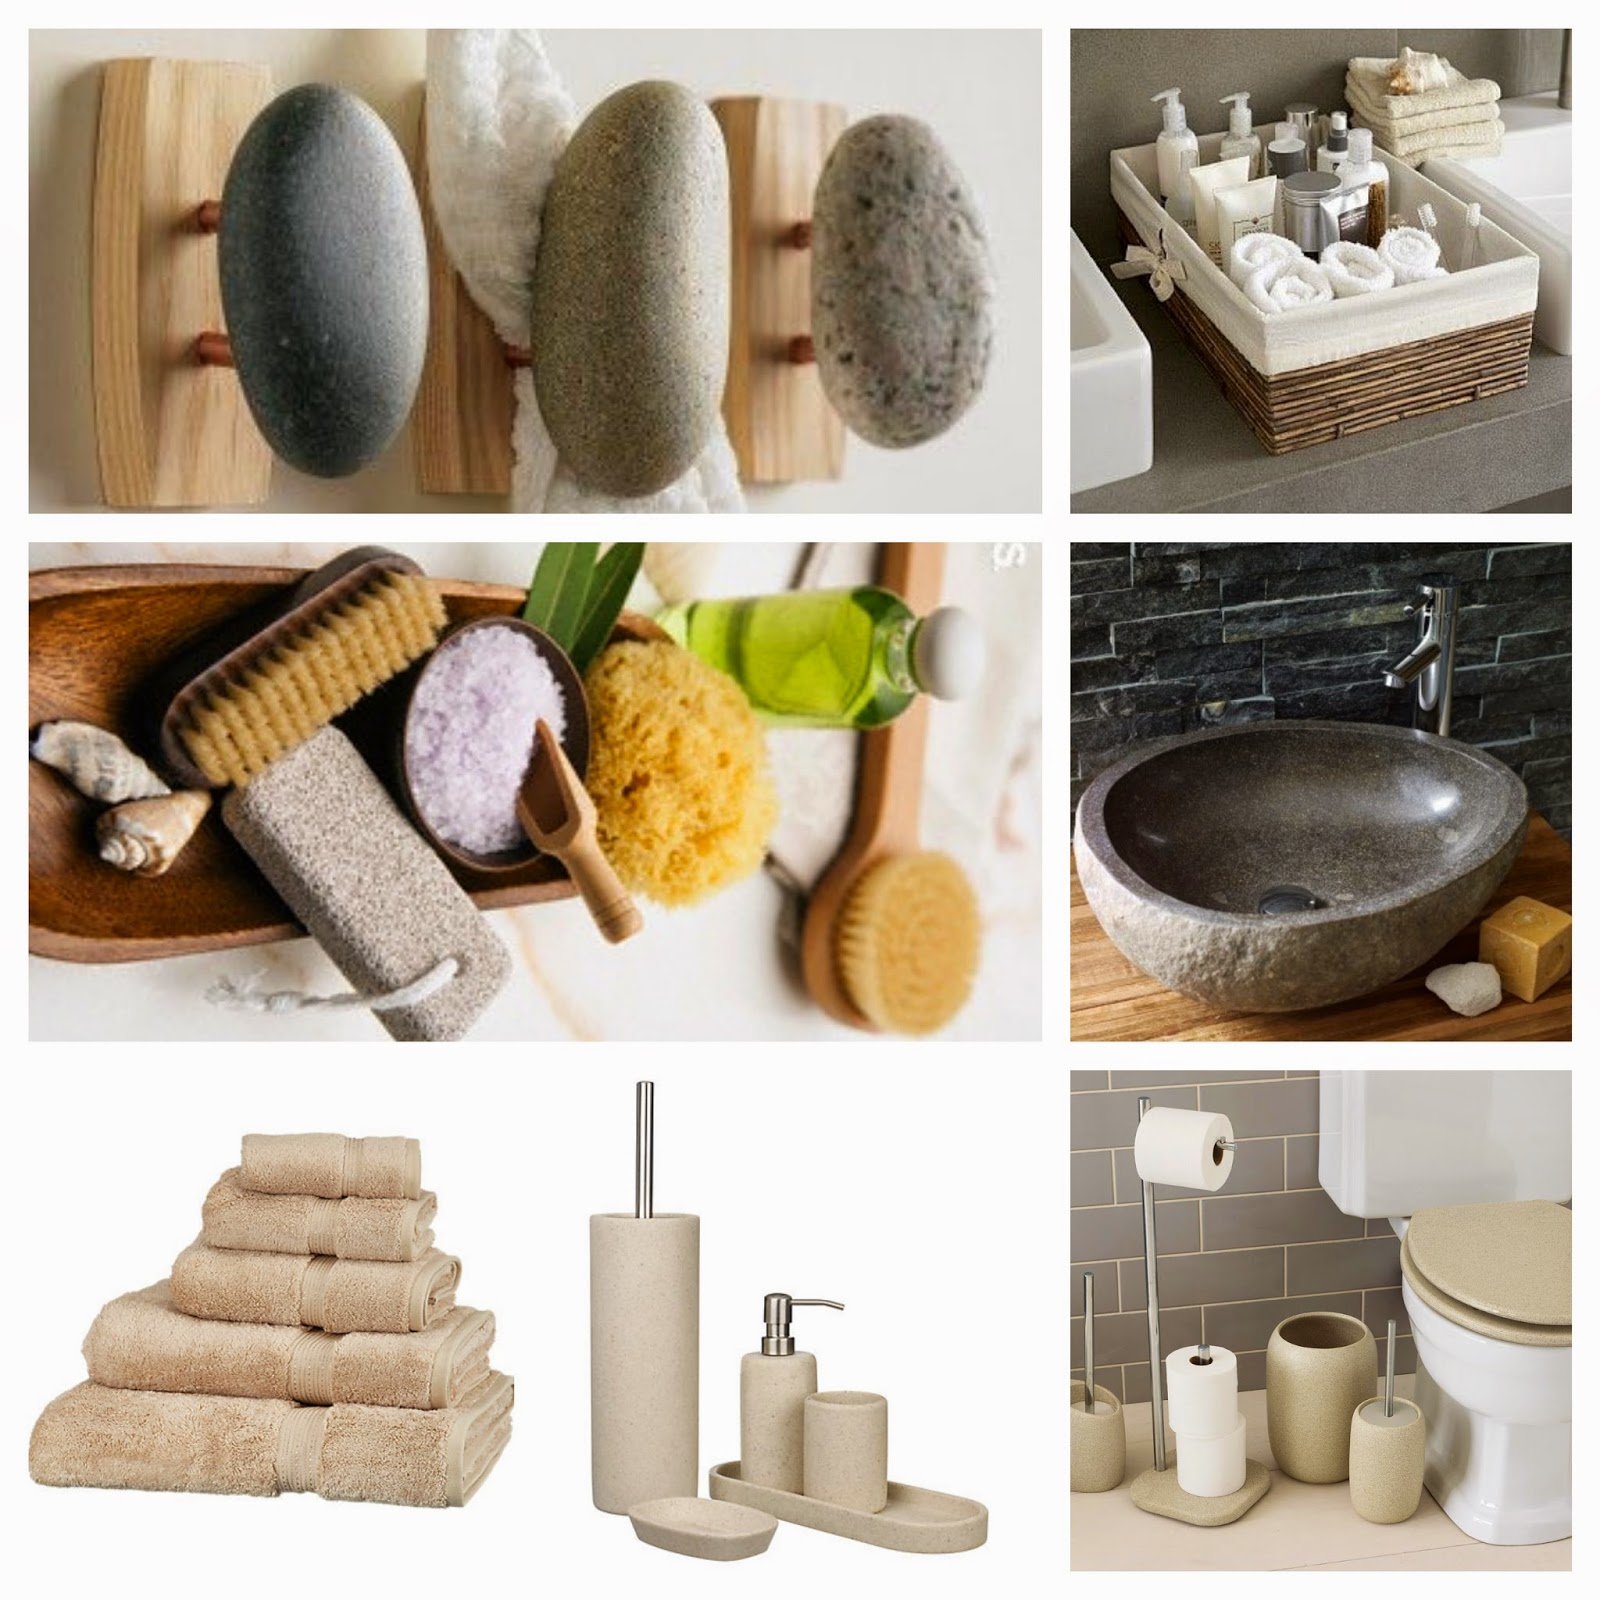 Spa Style Bathroom Accessories   Creating A Spa Style Bathroom Spa